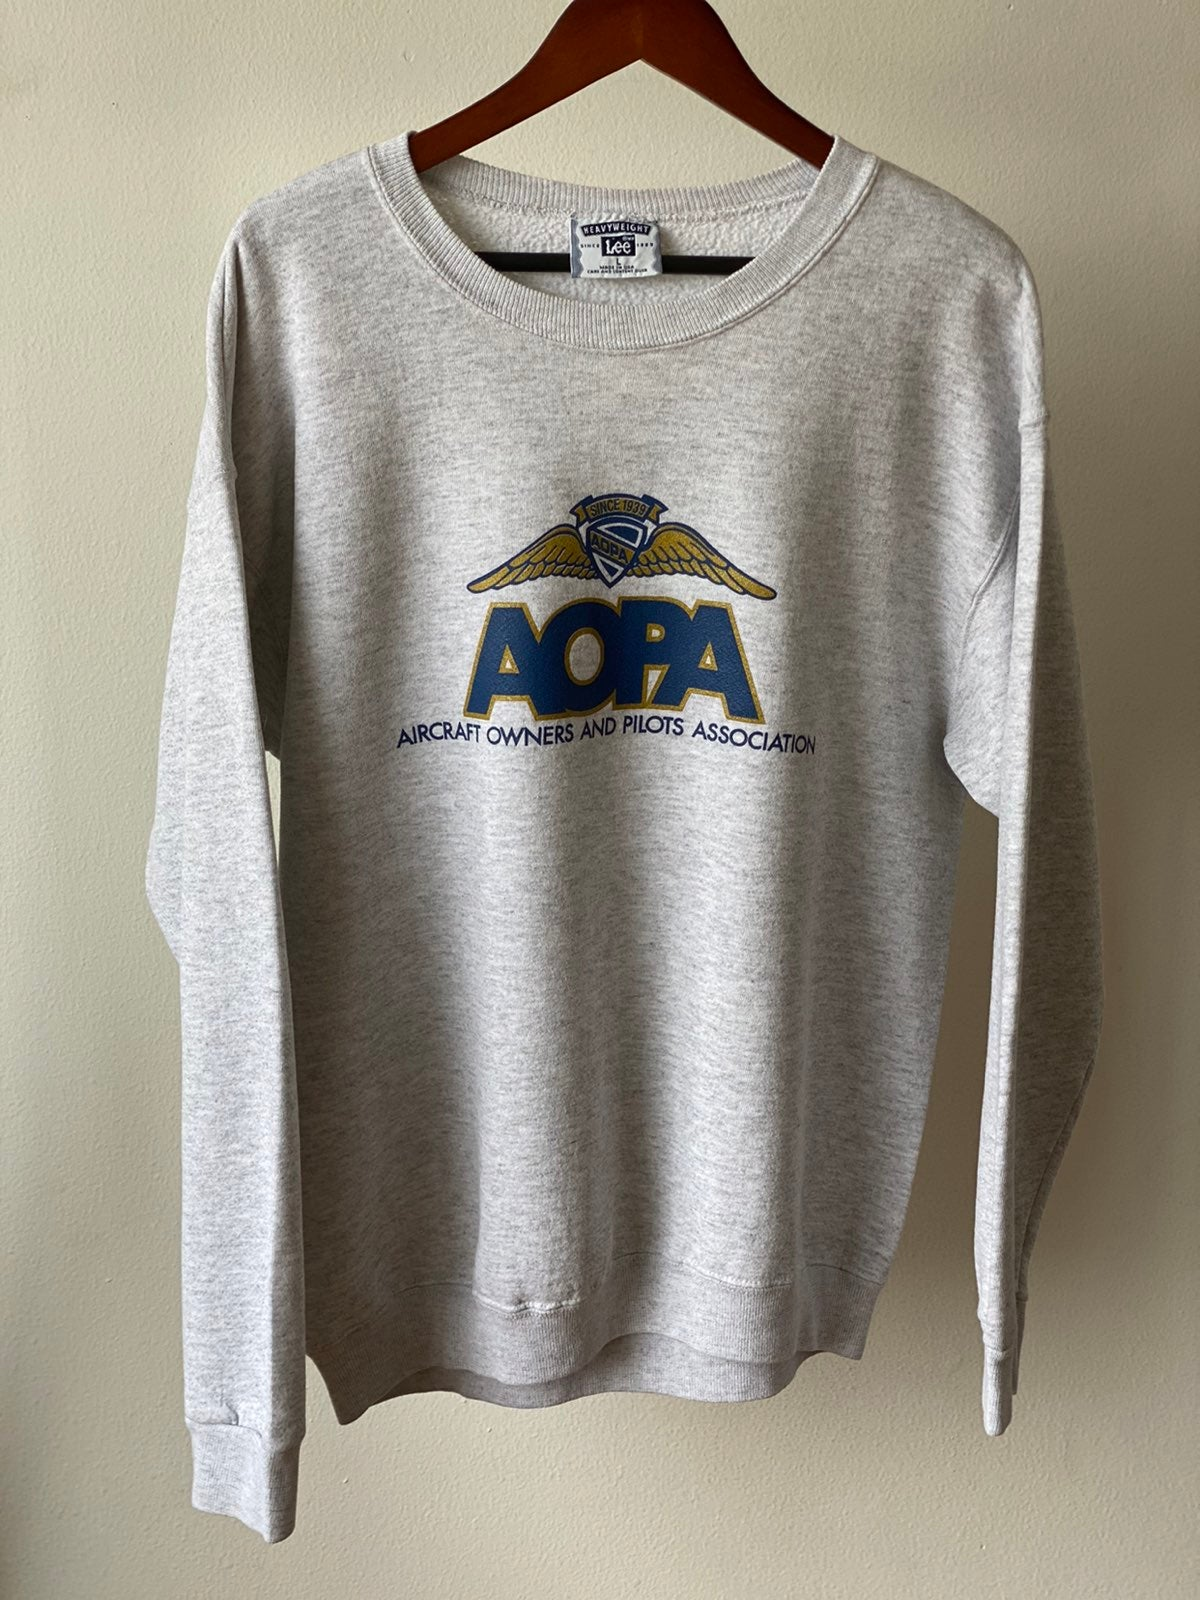 Vintage Lee AOPA Sweatshirt Sz L